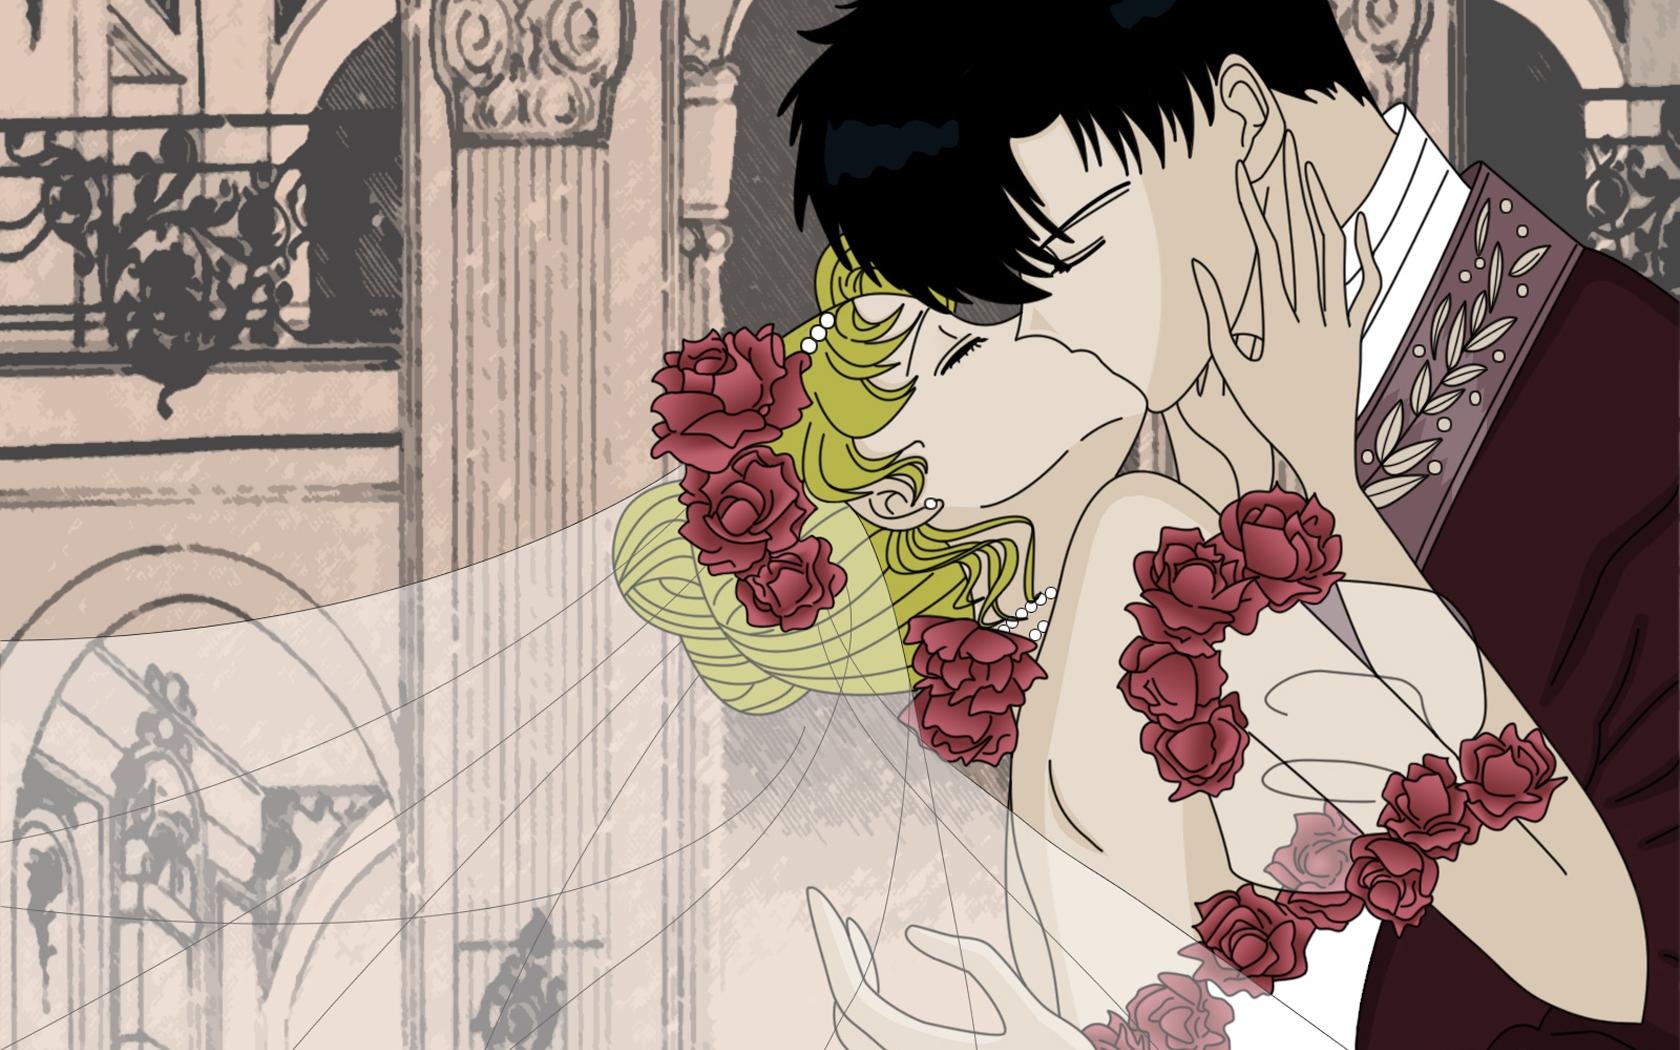 Wallpaper Ilustrasi Bunga Bunga Anime Gambar Kartun Komik